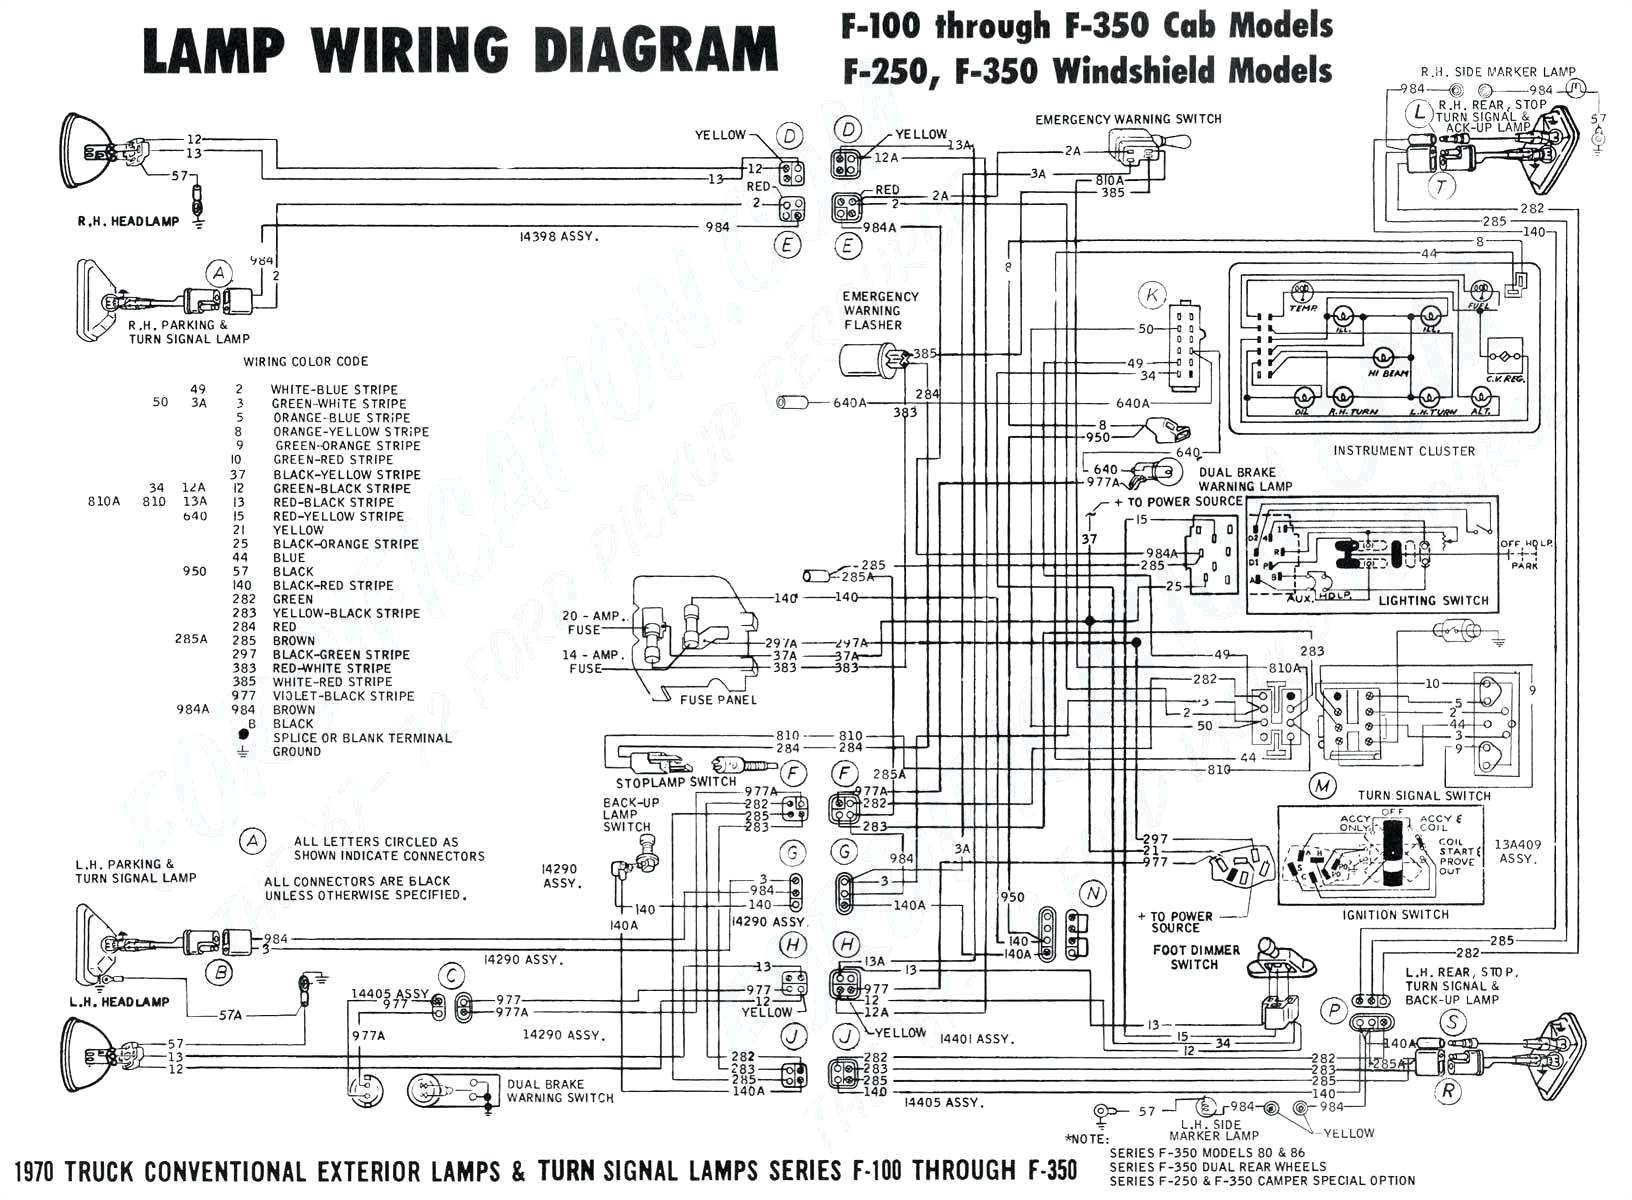 97 e350 wiring harness wiring diagram 2006 e350 wiring diagram